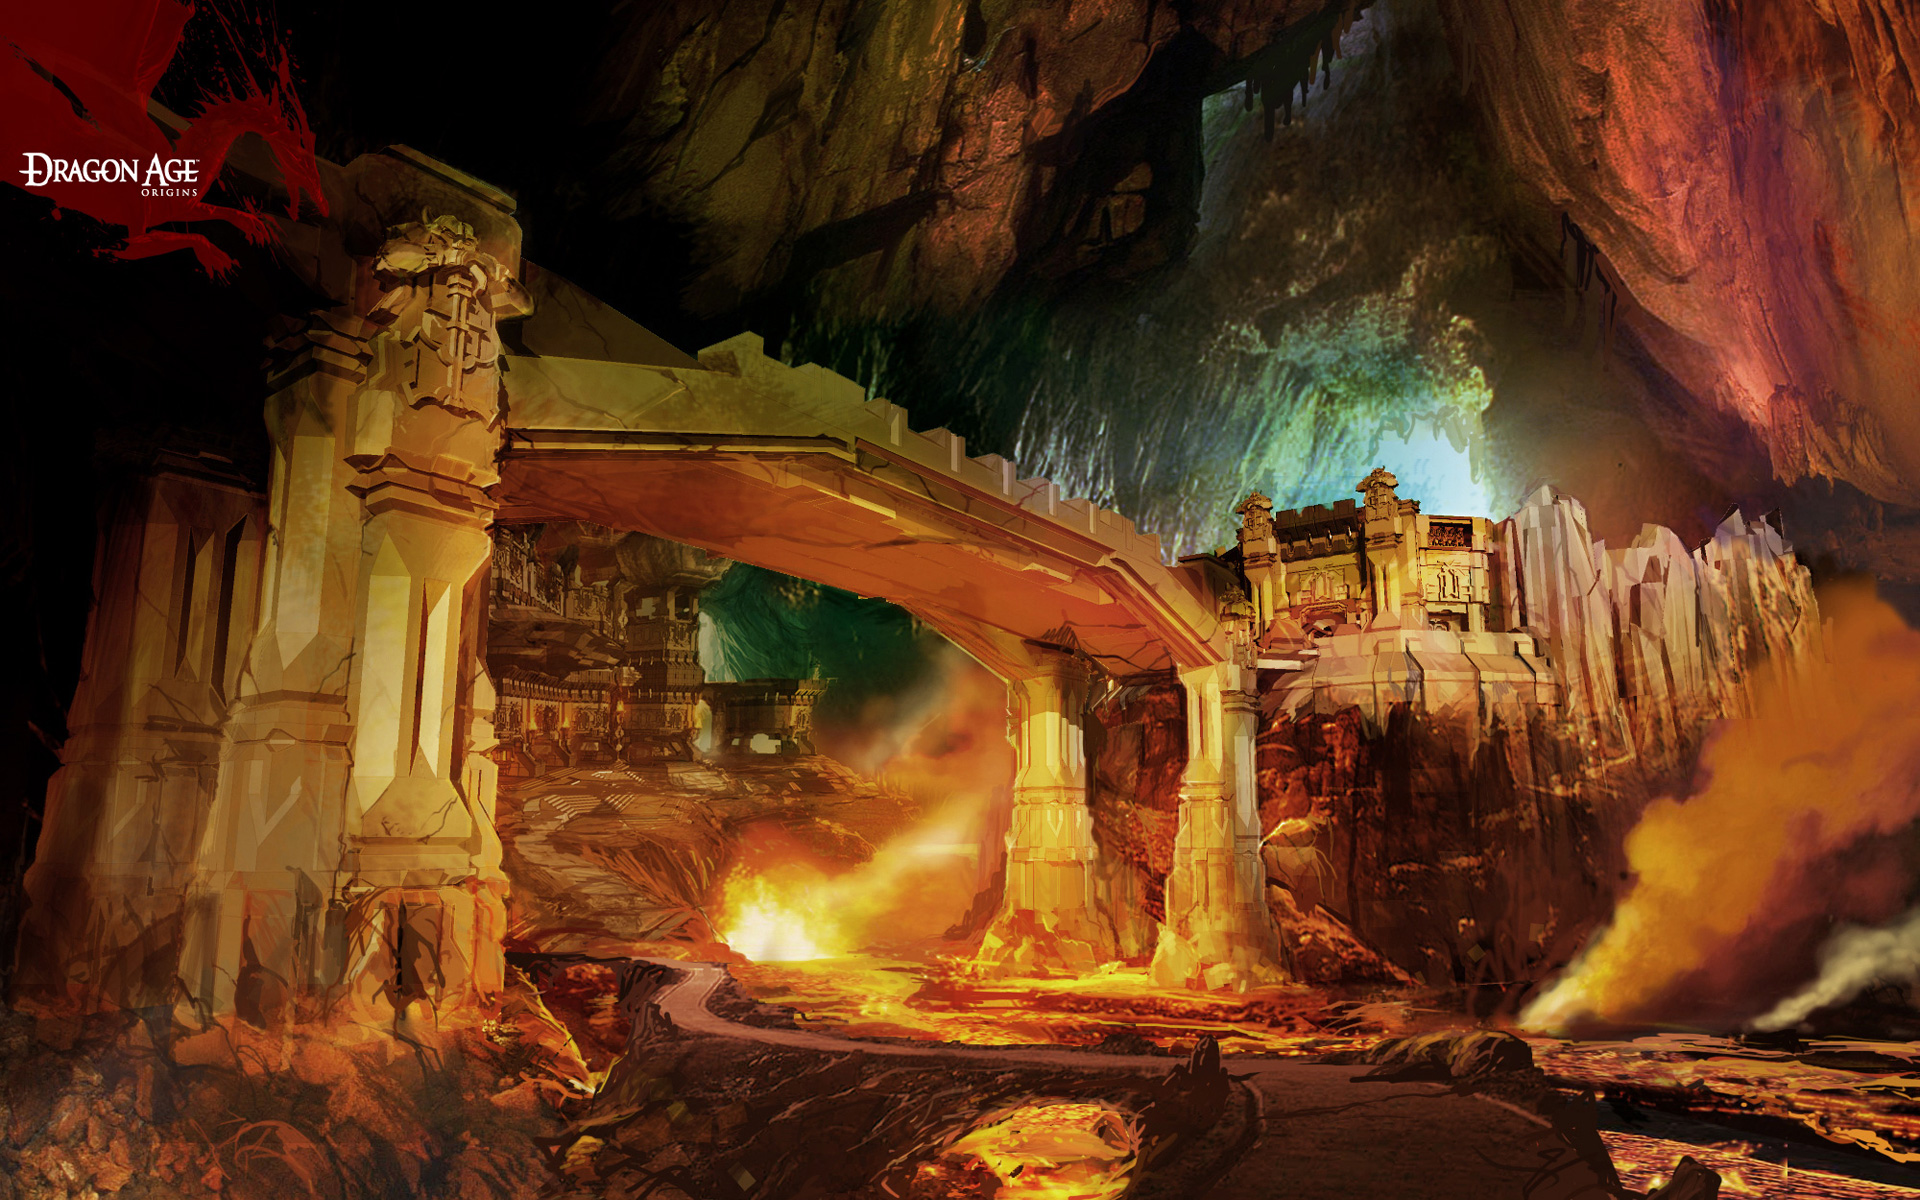 Dragon Age Origins Wallpapers: Dragon Age: Origins HD Wallpaper